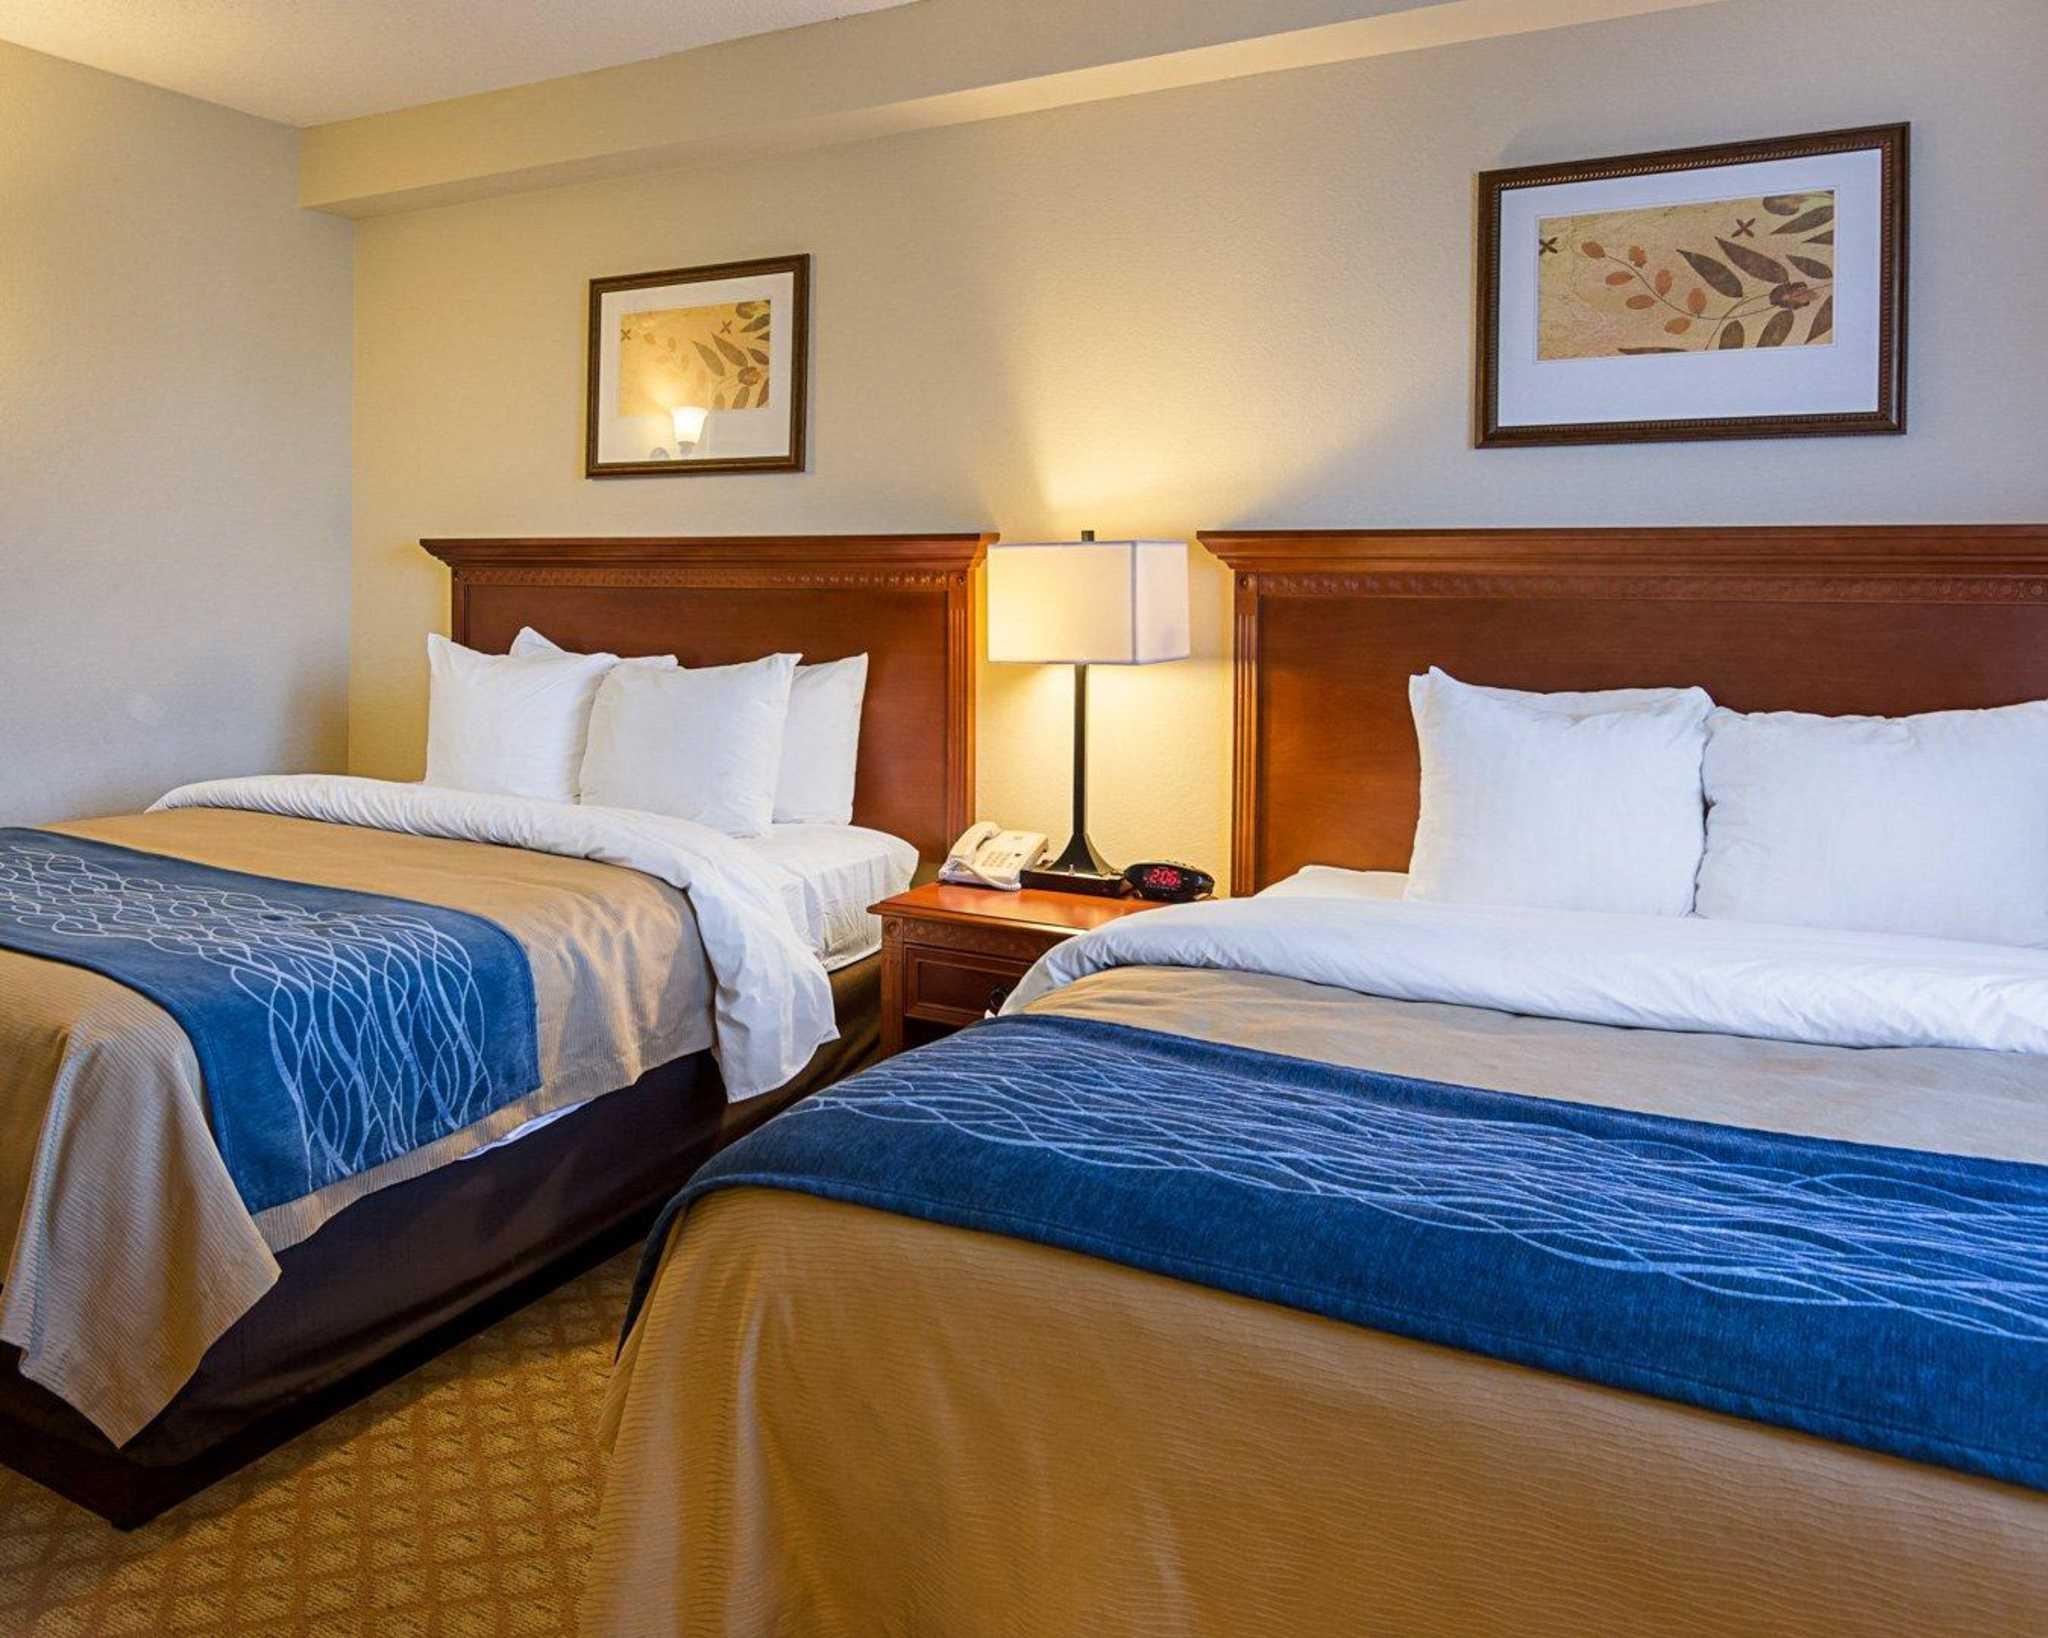 Https Www Choicehotels Com Virginia Virginia Beach Comfort Inn Hotels Va